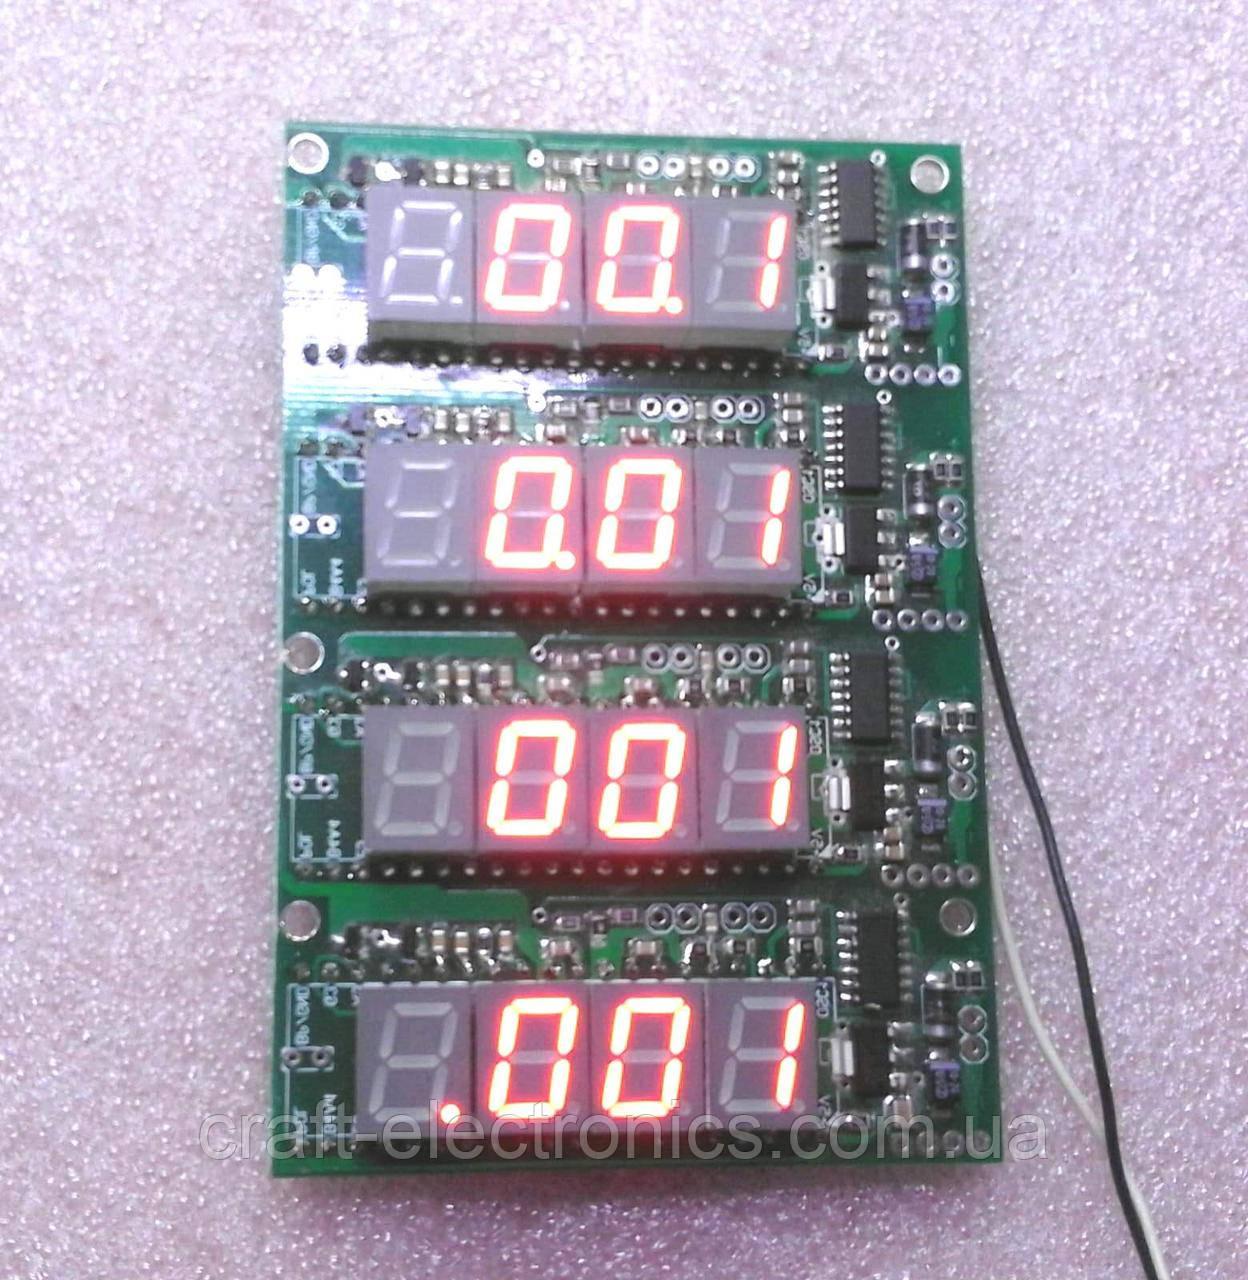 КР572ПВ2 Модуль прецизионного вольтметра на чипе КР572ПВ2